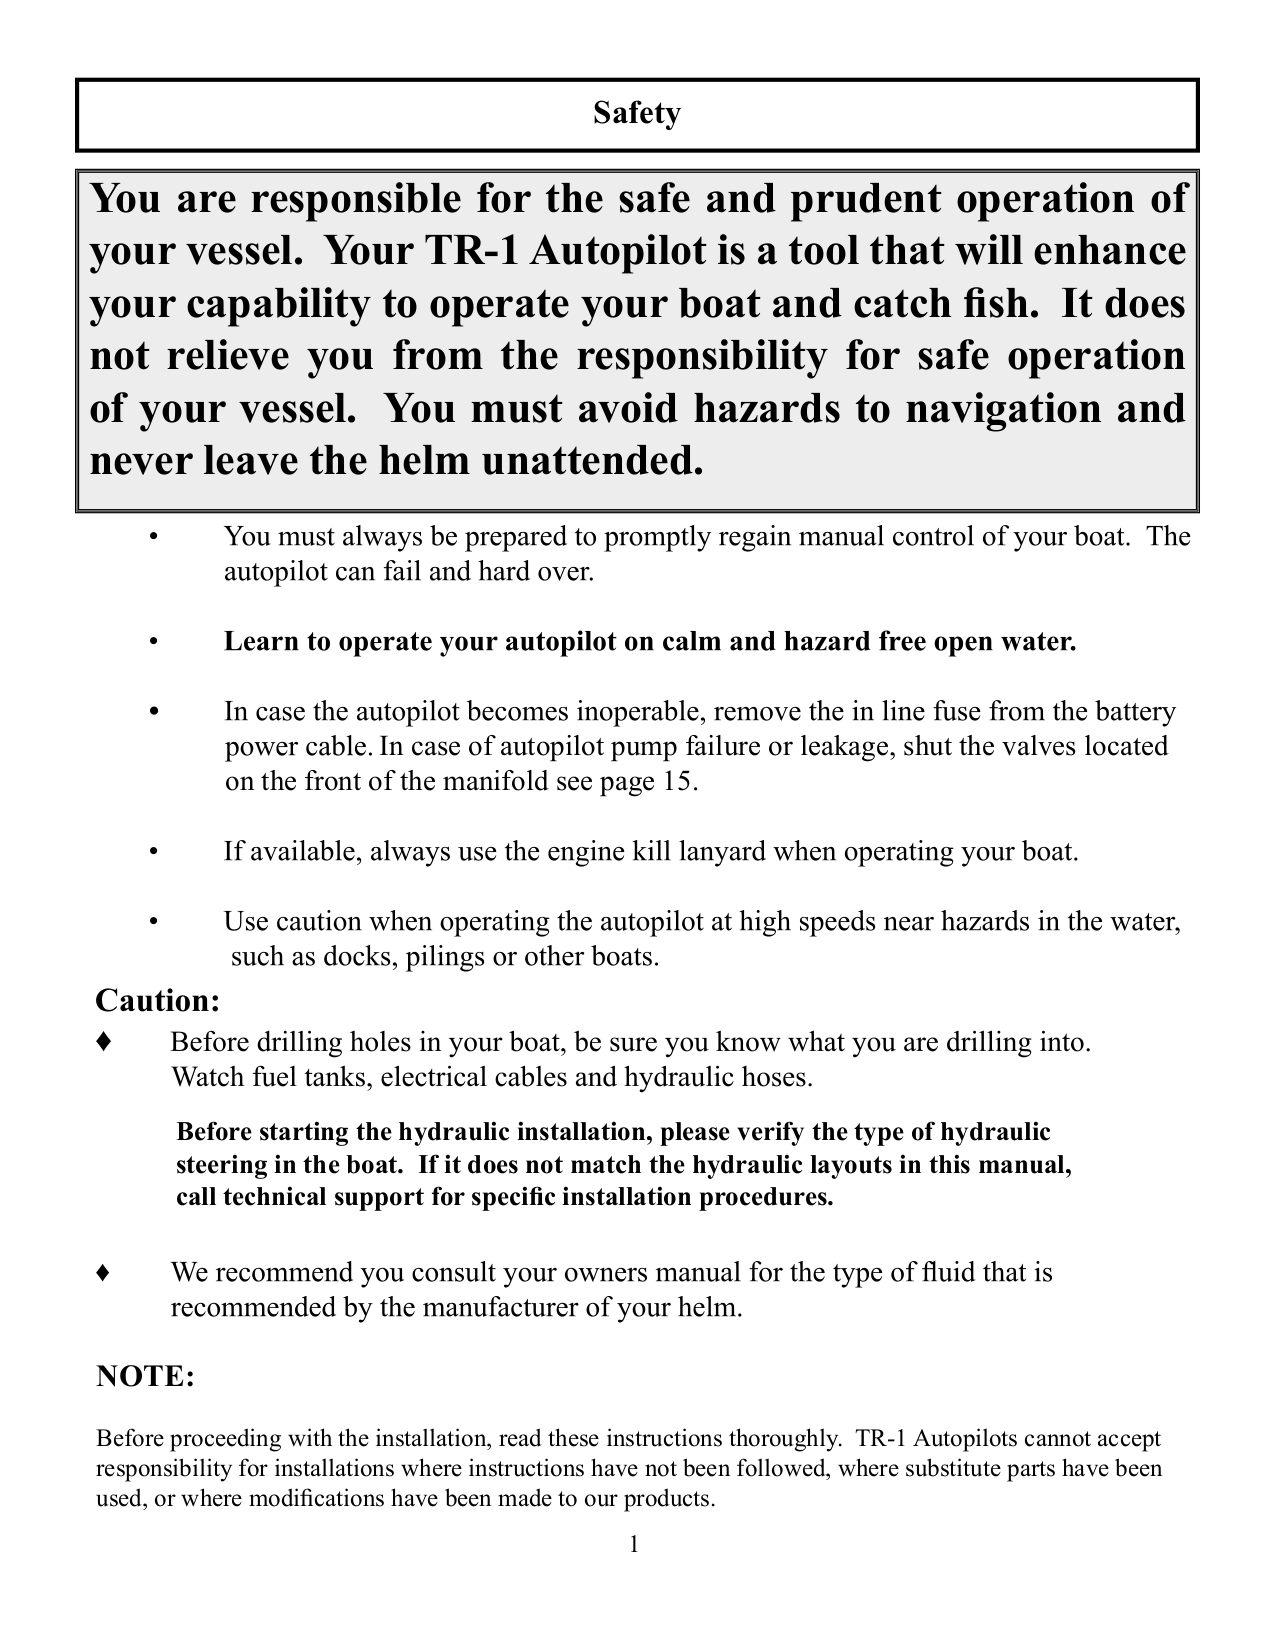 pdf for Lowrance GPS GlobalMap 4800M manual